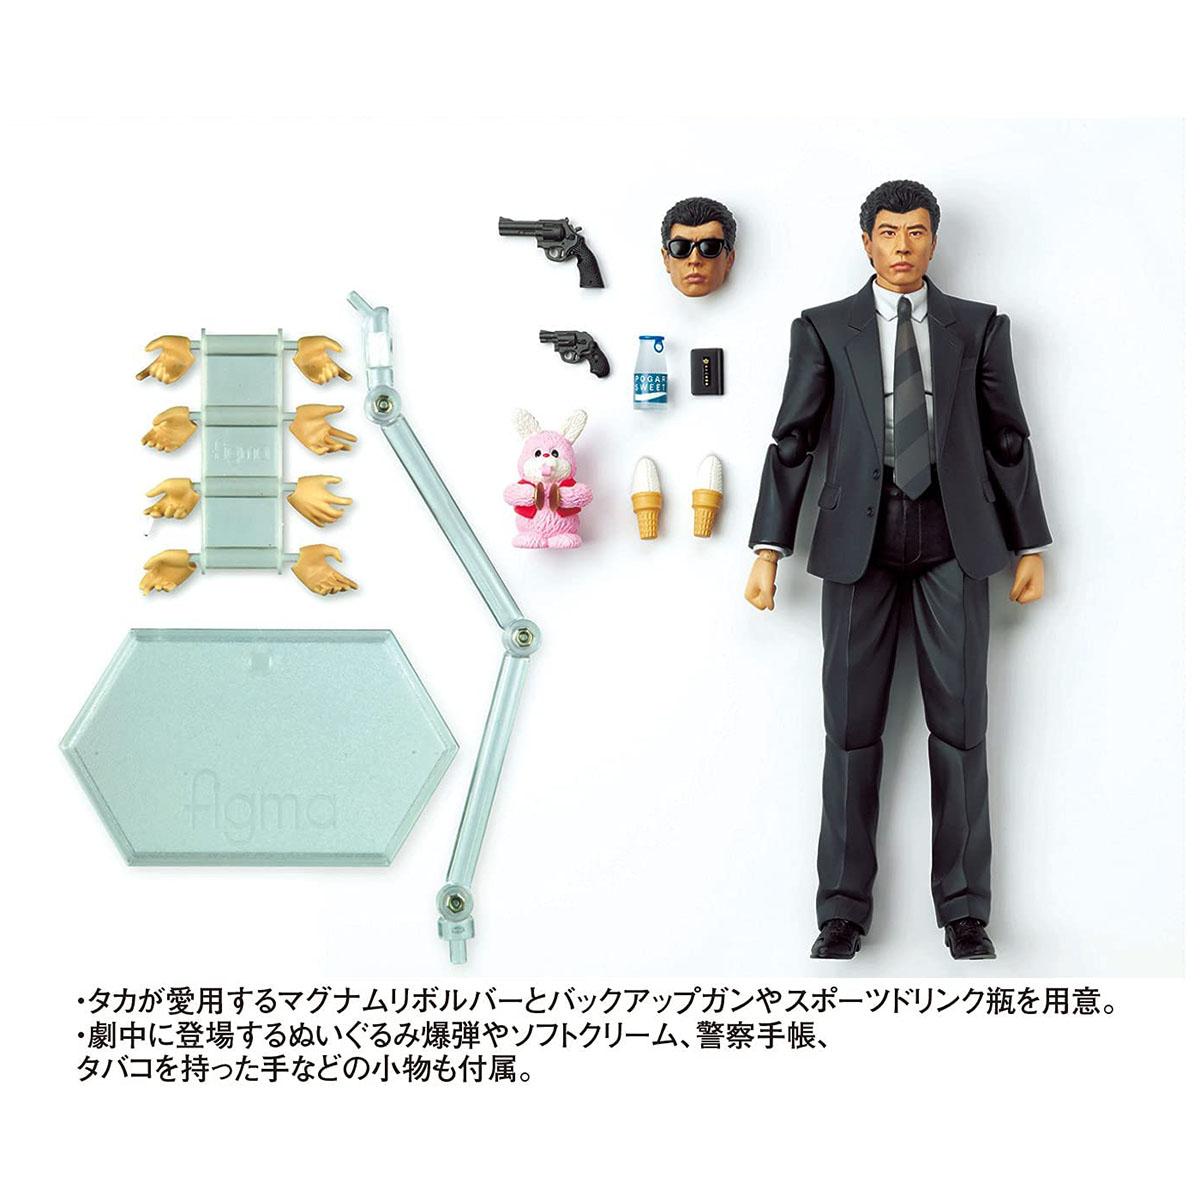 【DB】あぶない刑事 Blu-ray BOX VOL,1『タカフィギュア付き』完全予約限定生産-018